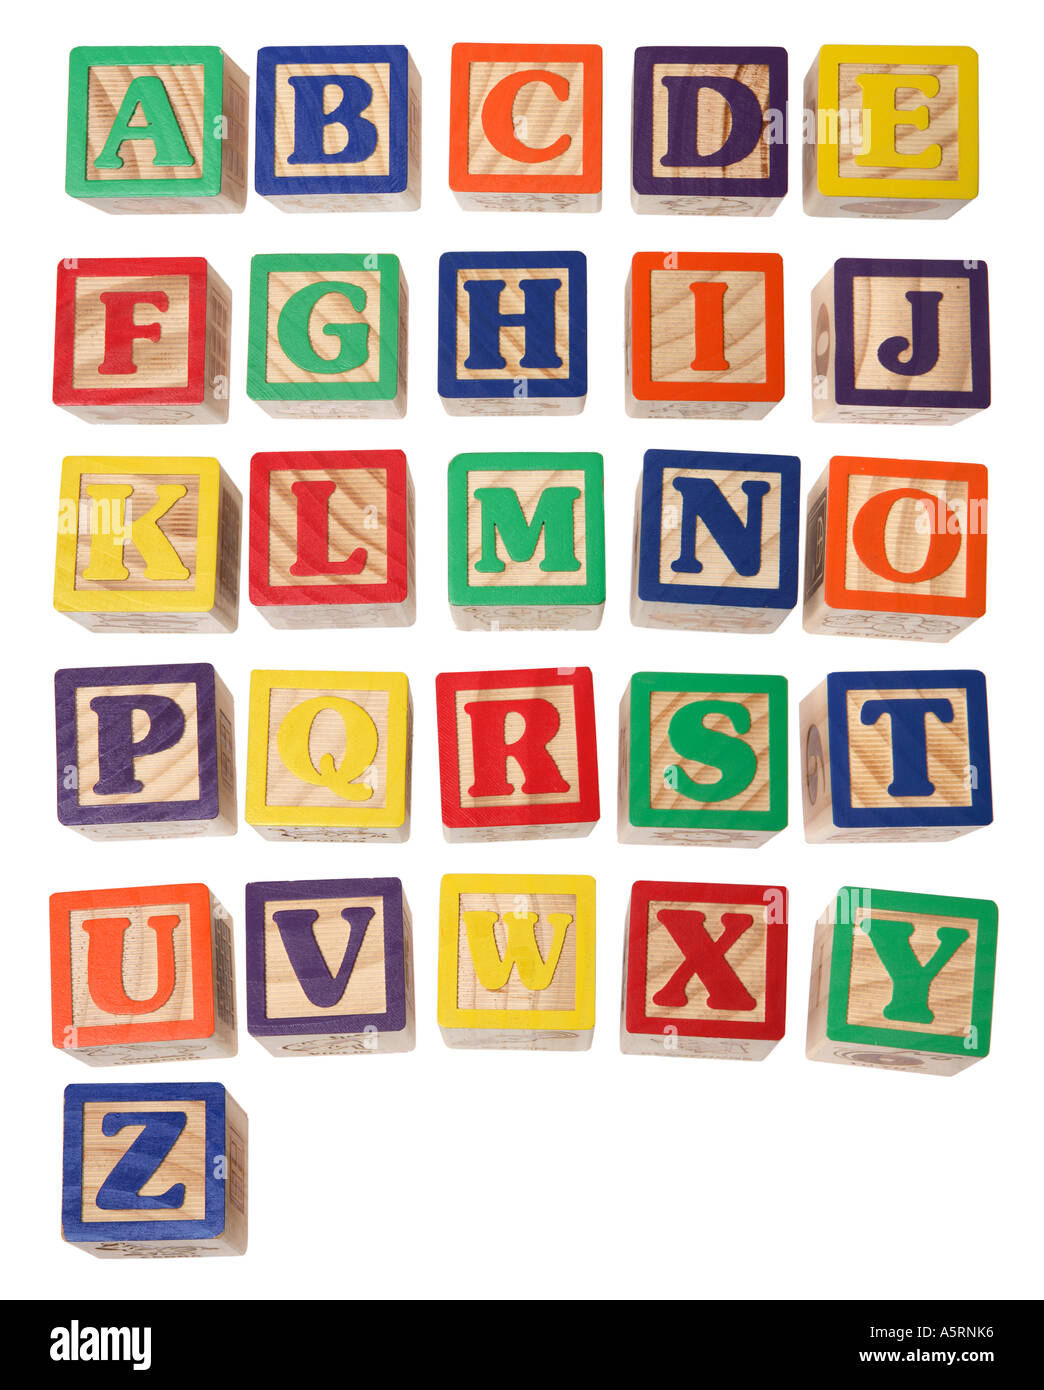 Alphabet Blocks A Z Stock Photo Royalty Free Image